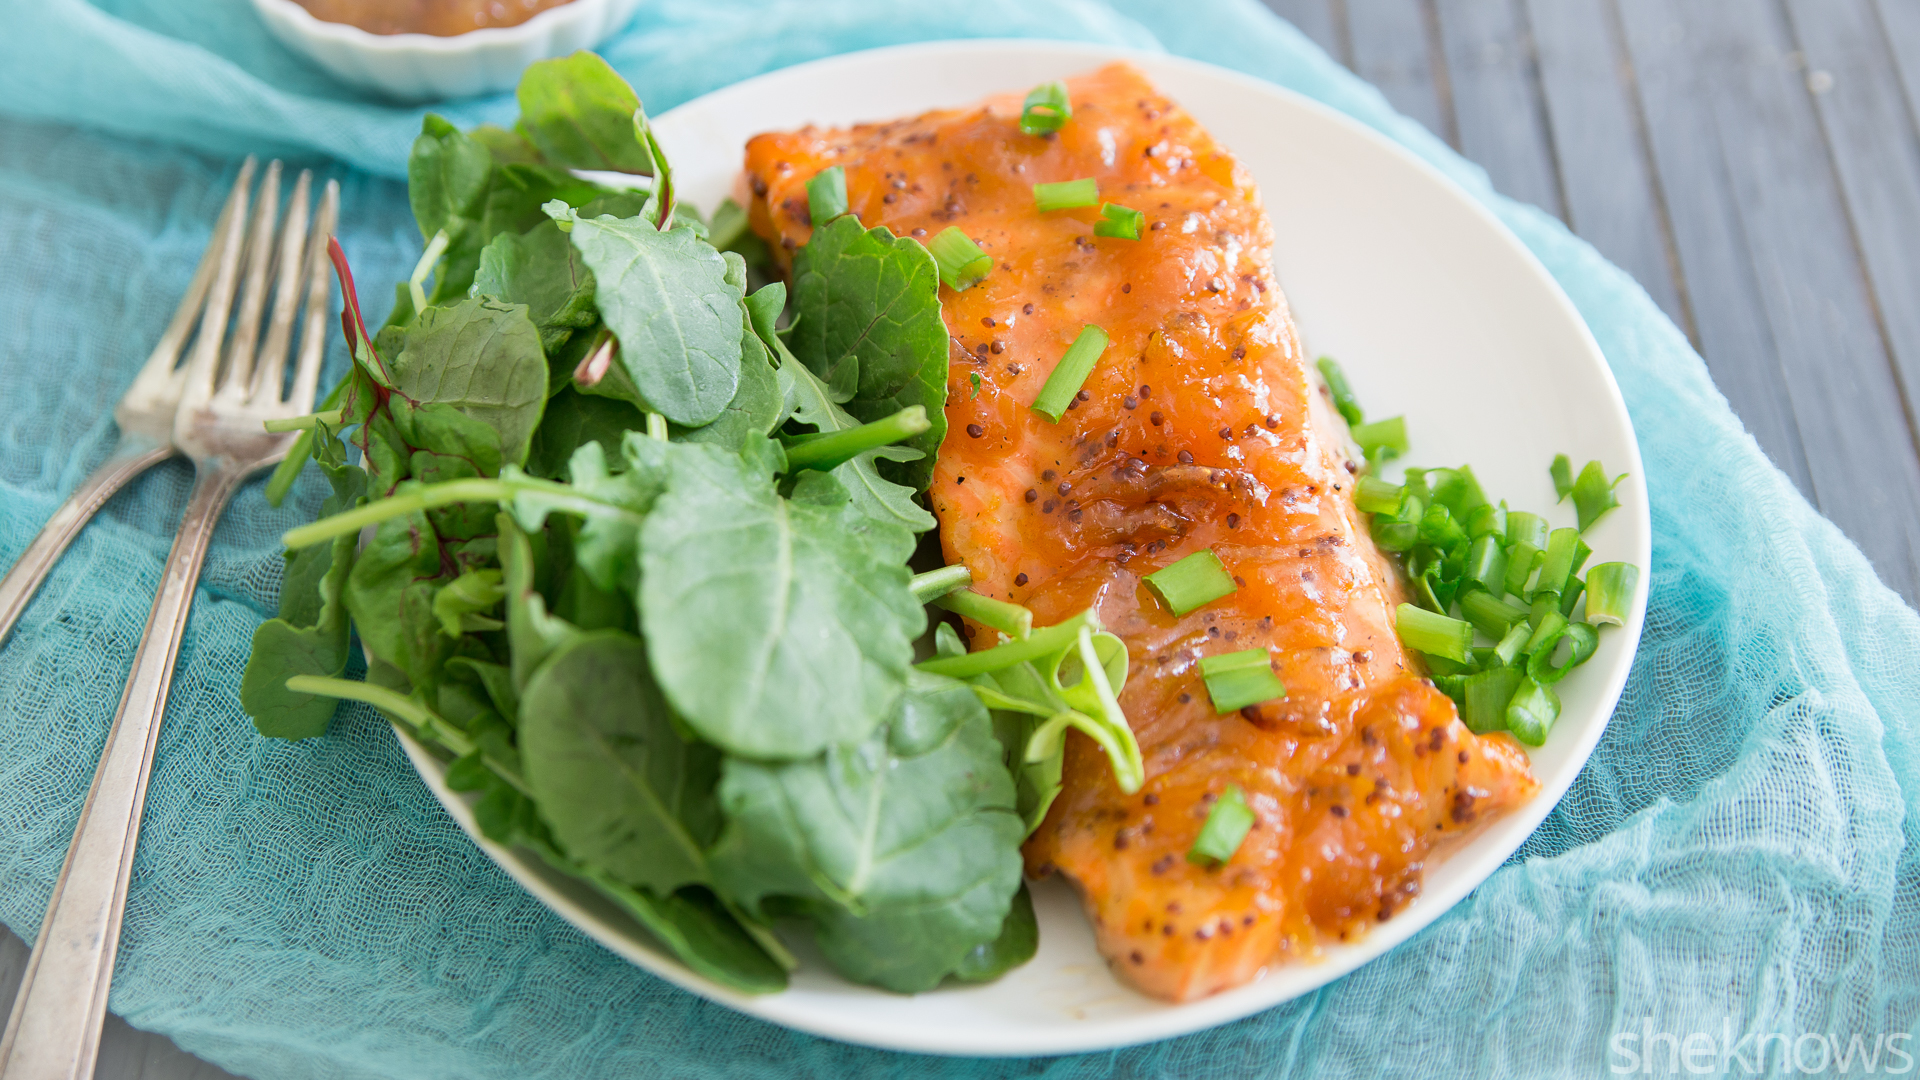 d41b970a76a7 Dijon-apricot glazed salmon in 15 minutes flat – SheKnows